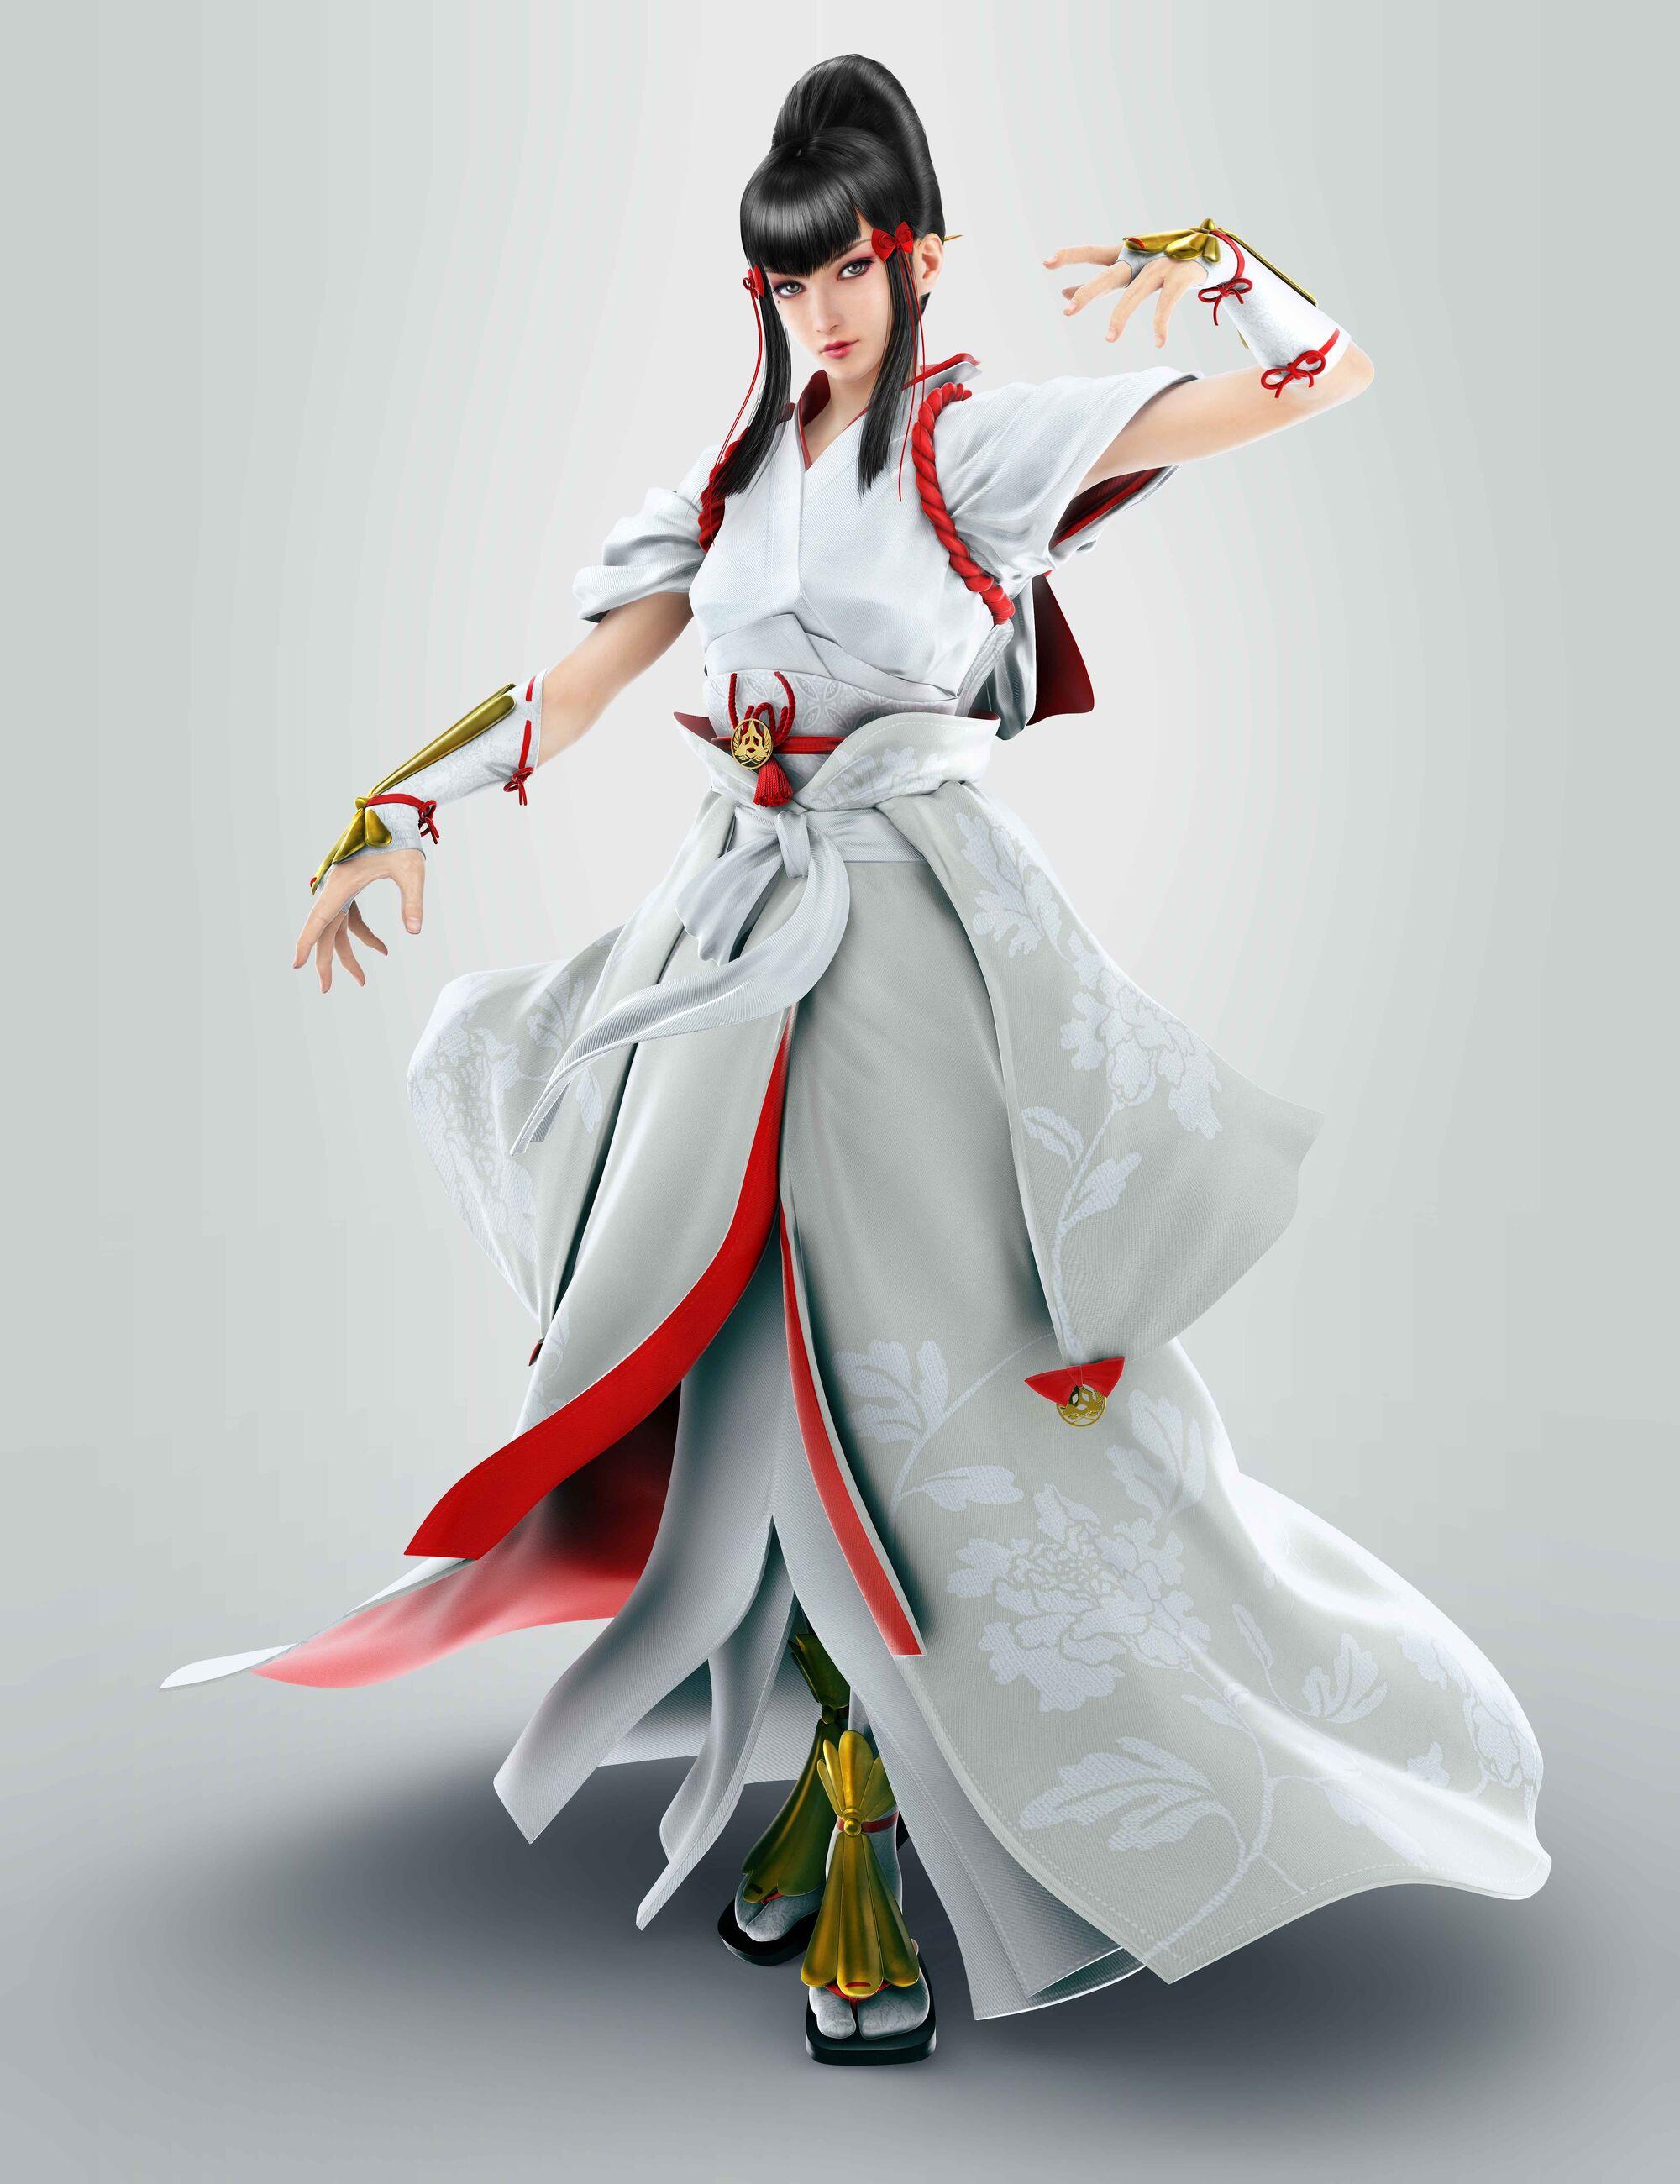 Kazumi Mishima | Tekken Wiki | Fandom